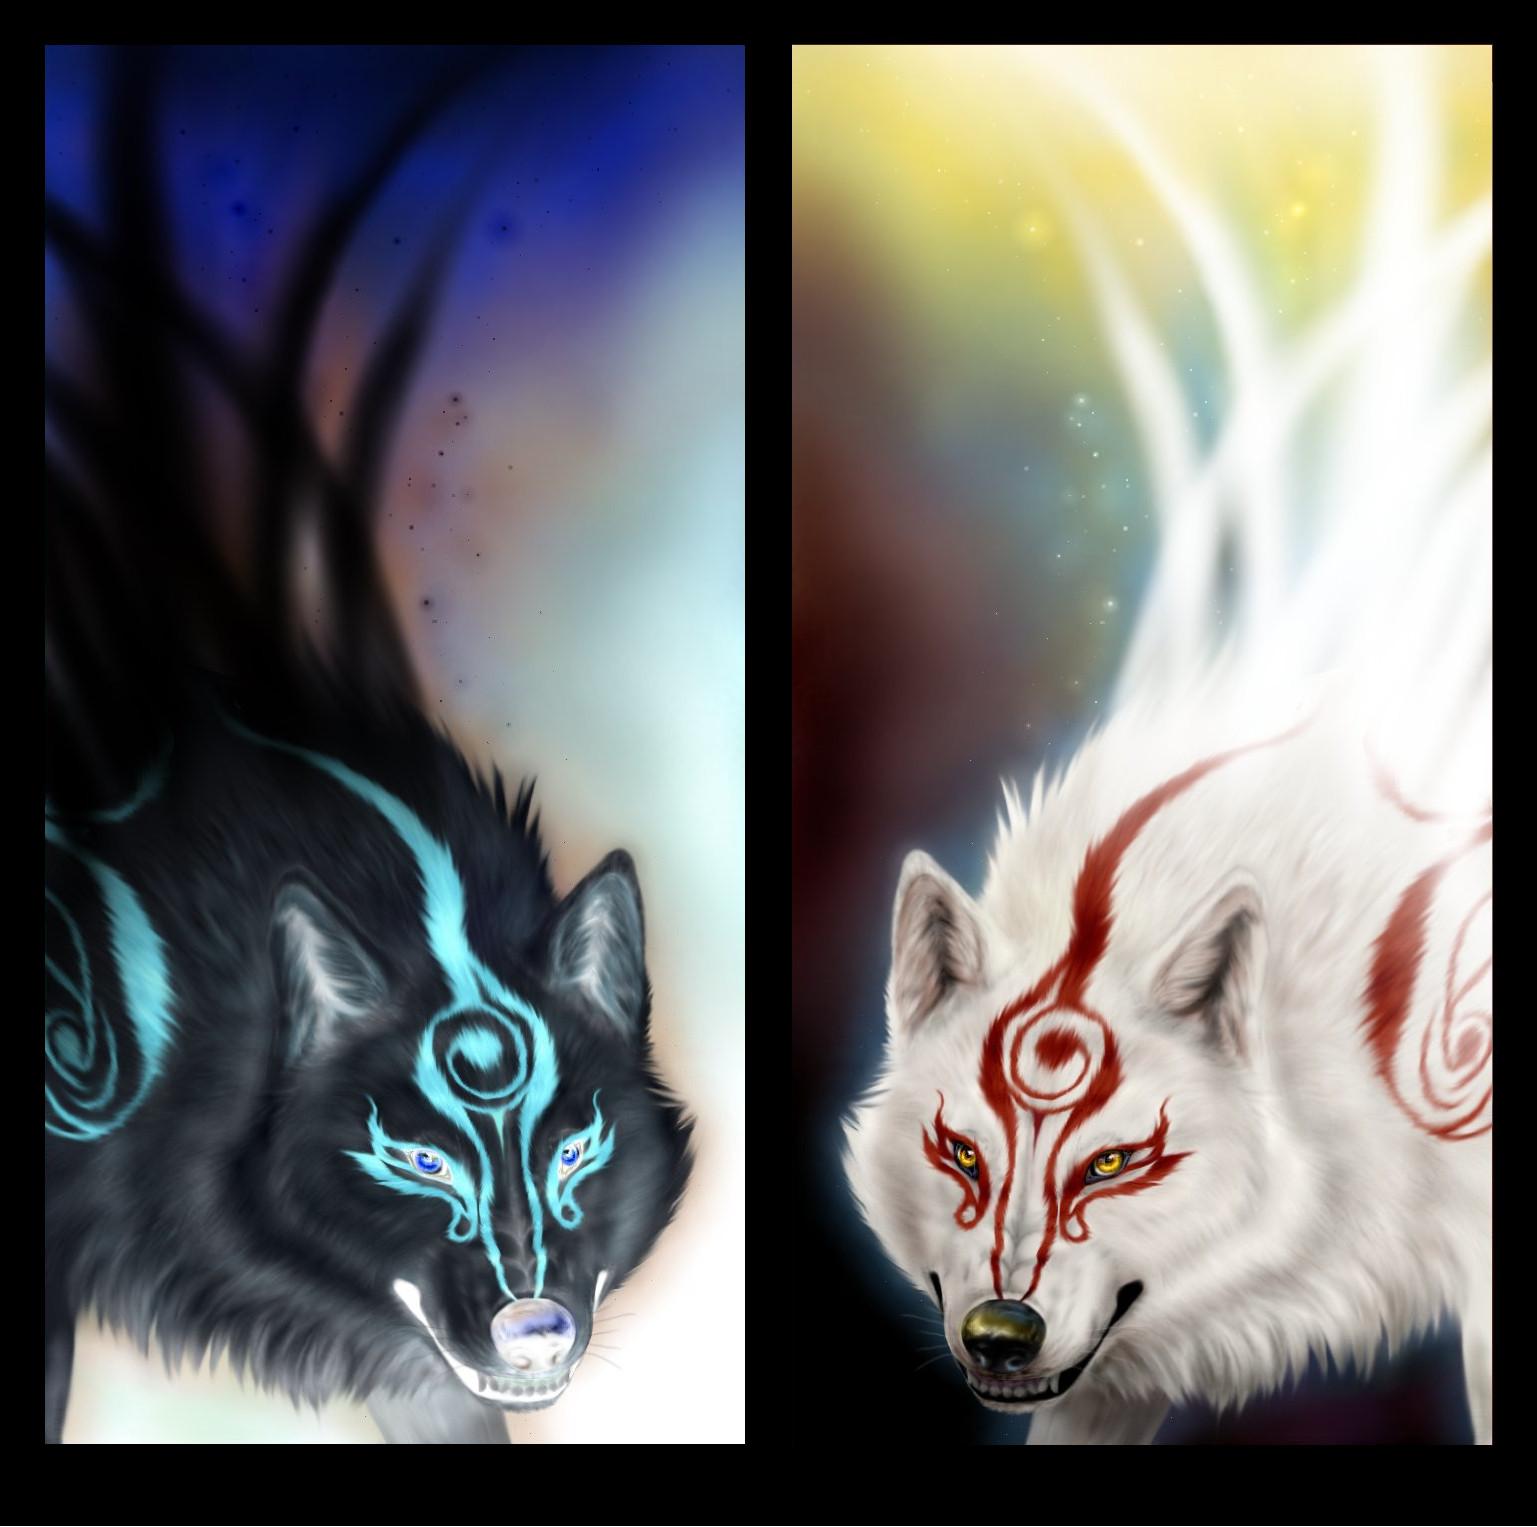 White Wolf And Black Wolf by TrreisyWhiteWolf 20 5BDesktopNexus com 5D    White Wolf And Black Wolf Fighting